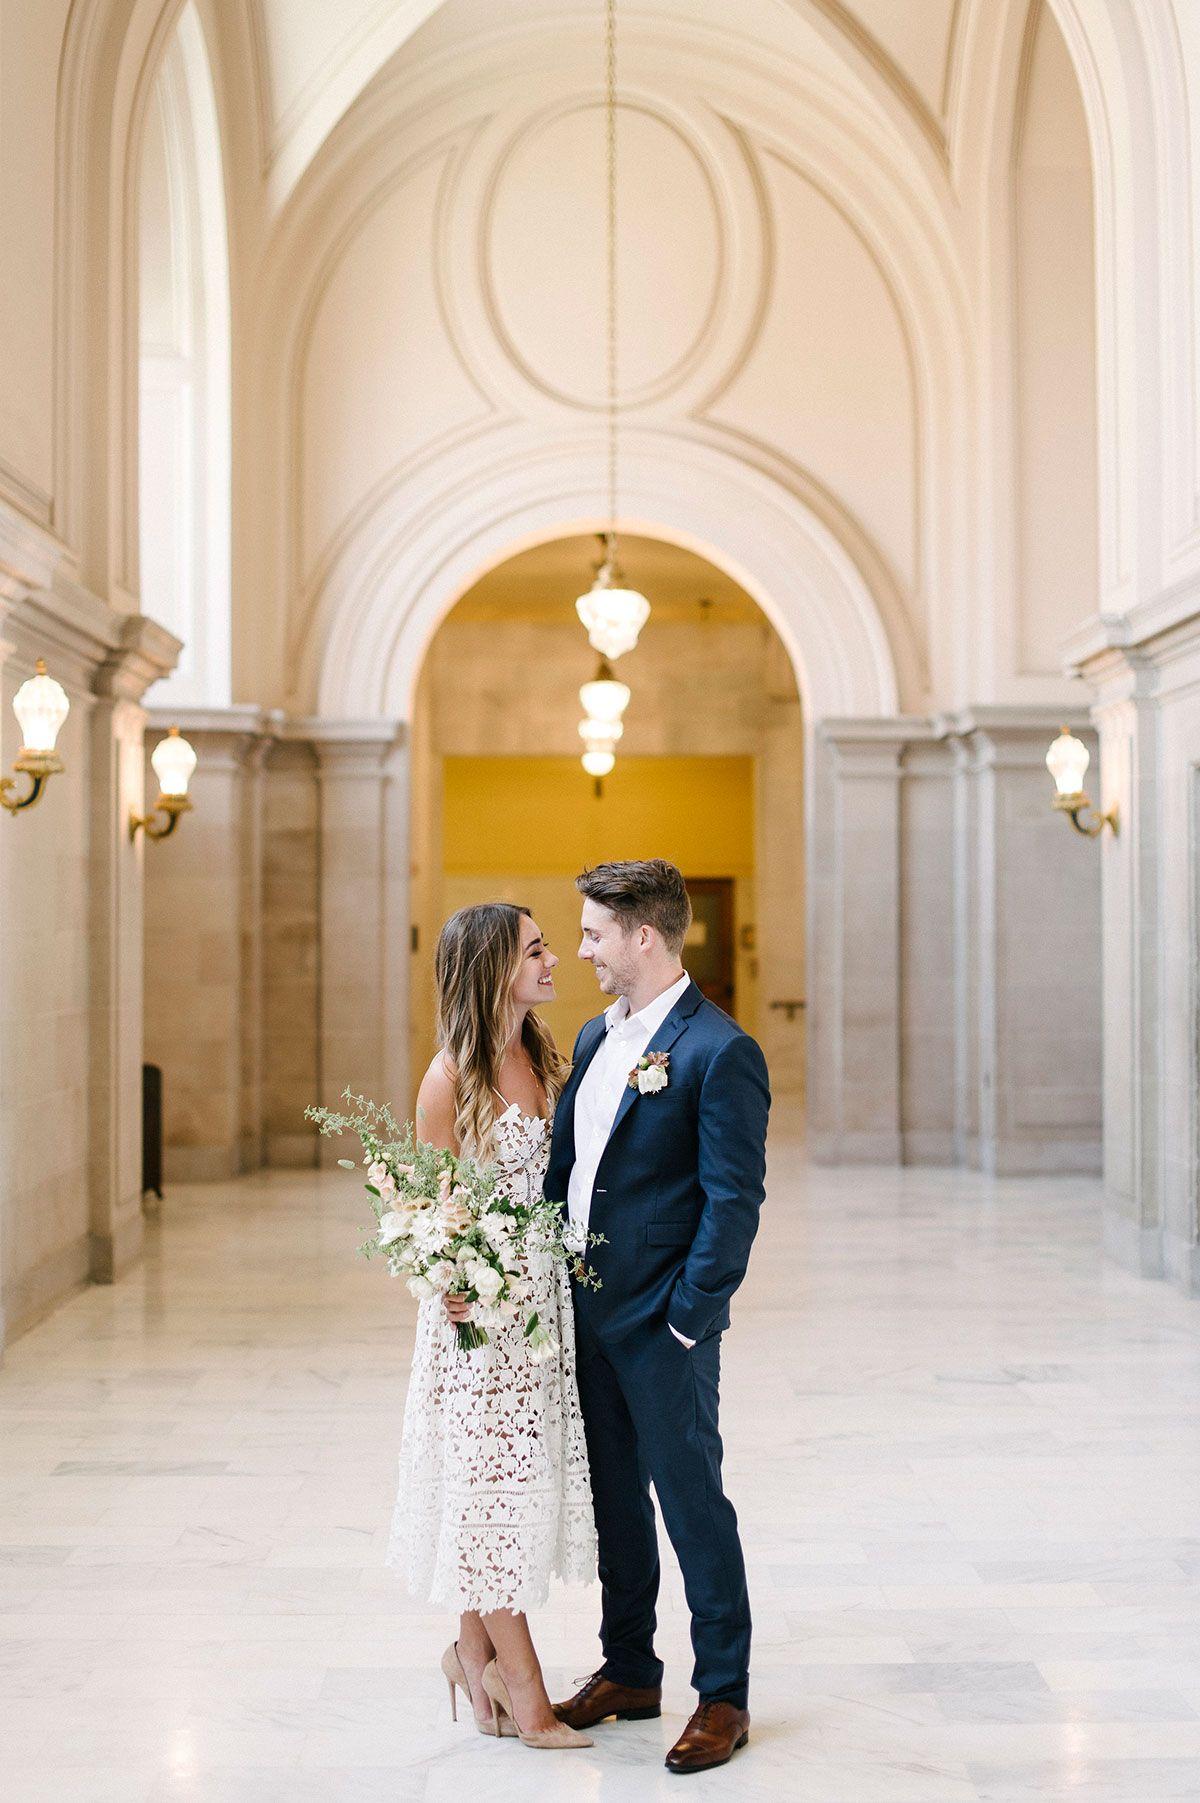 Ten city hall wedding tips melanie duerkopp photography